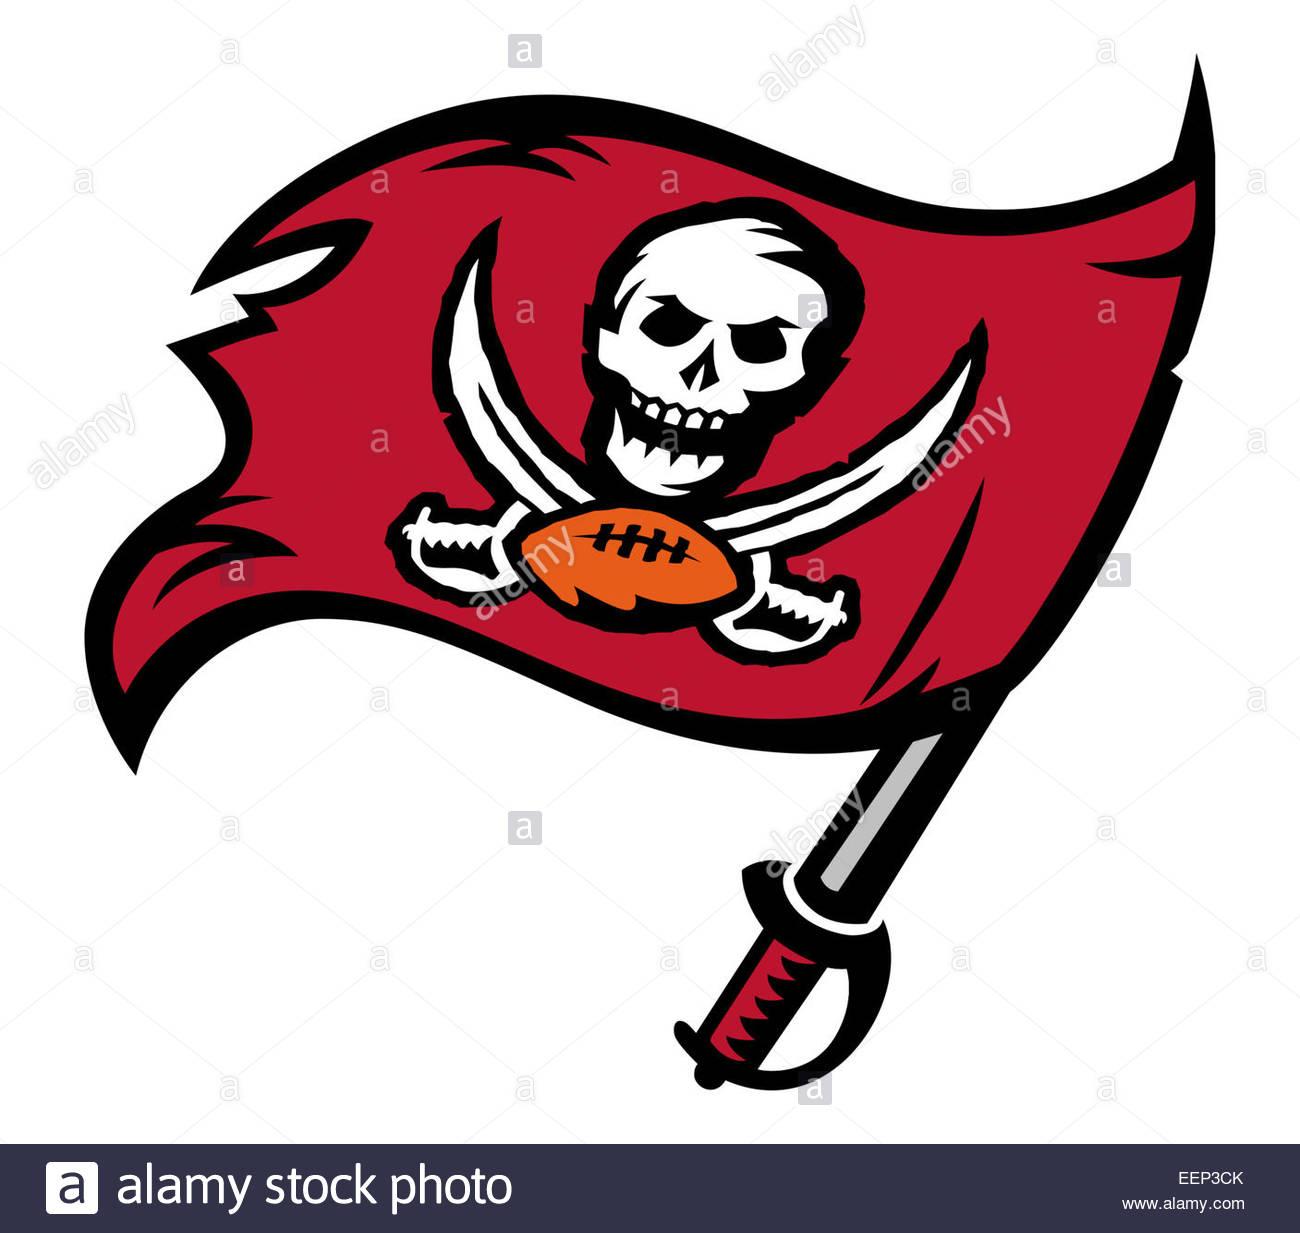 Tampa Bay Buccaneers logo icon symbol Stock Photo  77932307 - Alamy a6989bca63c